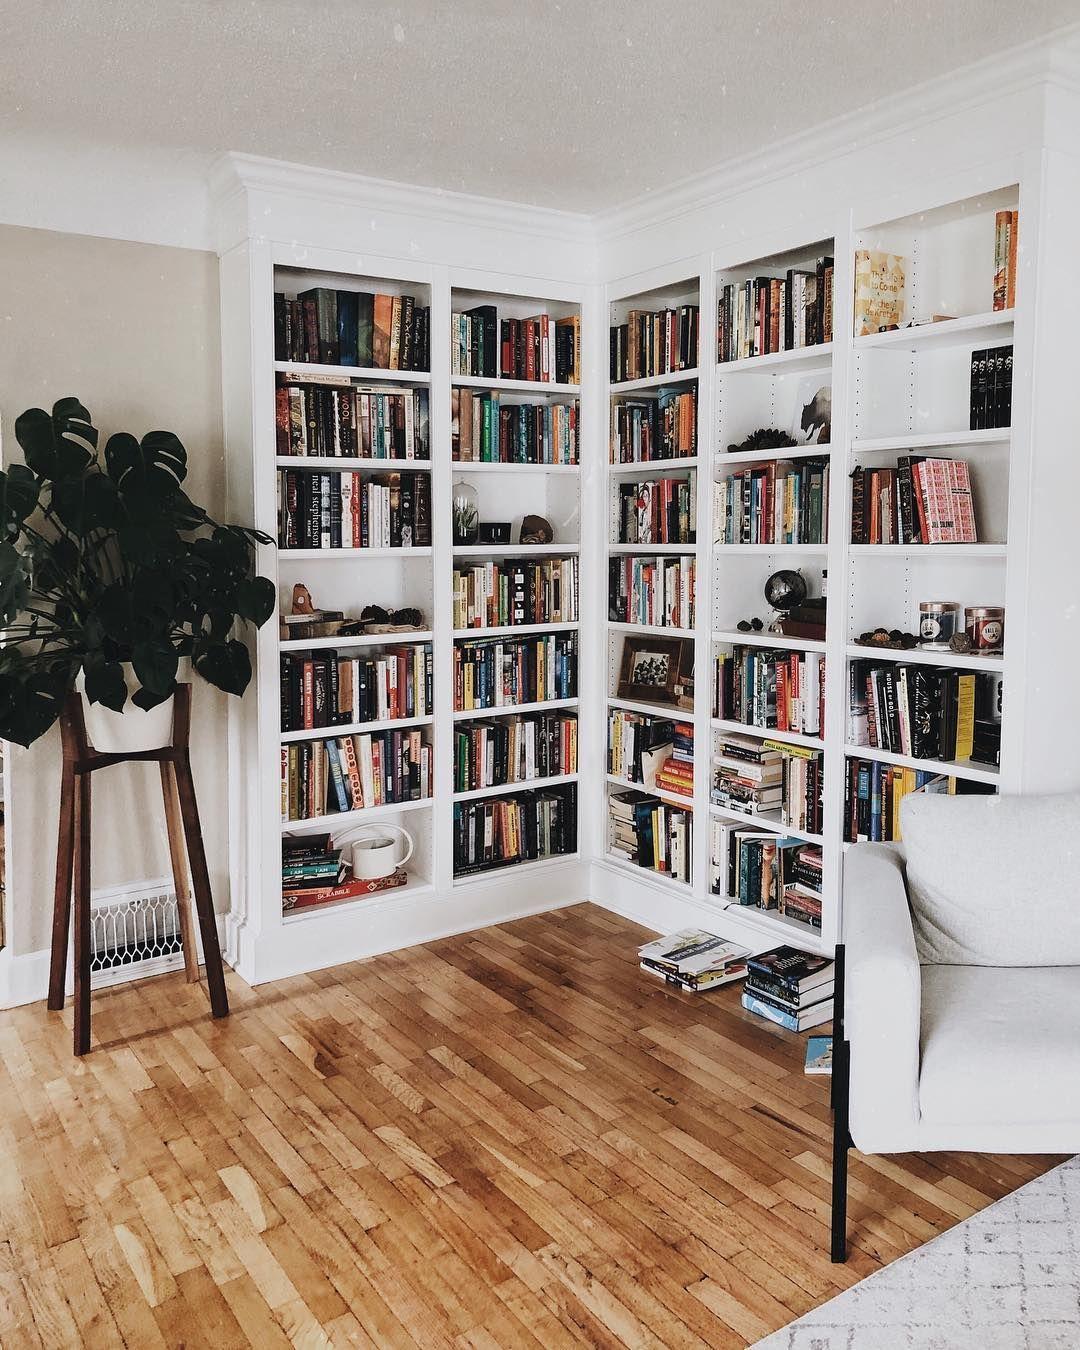 "Jenna on Instagram: ""Got some empty shelf space that needs filling 🤓 . . . . . #shelfie #bookshelves #bookshelf #builtins #bookish #bookstagram #bibliophile…"""